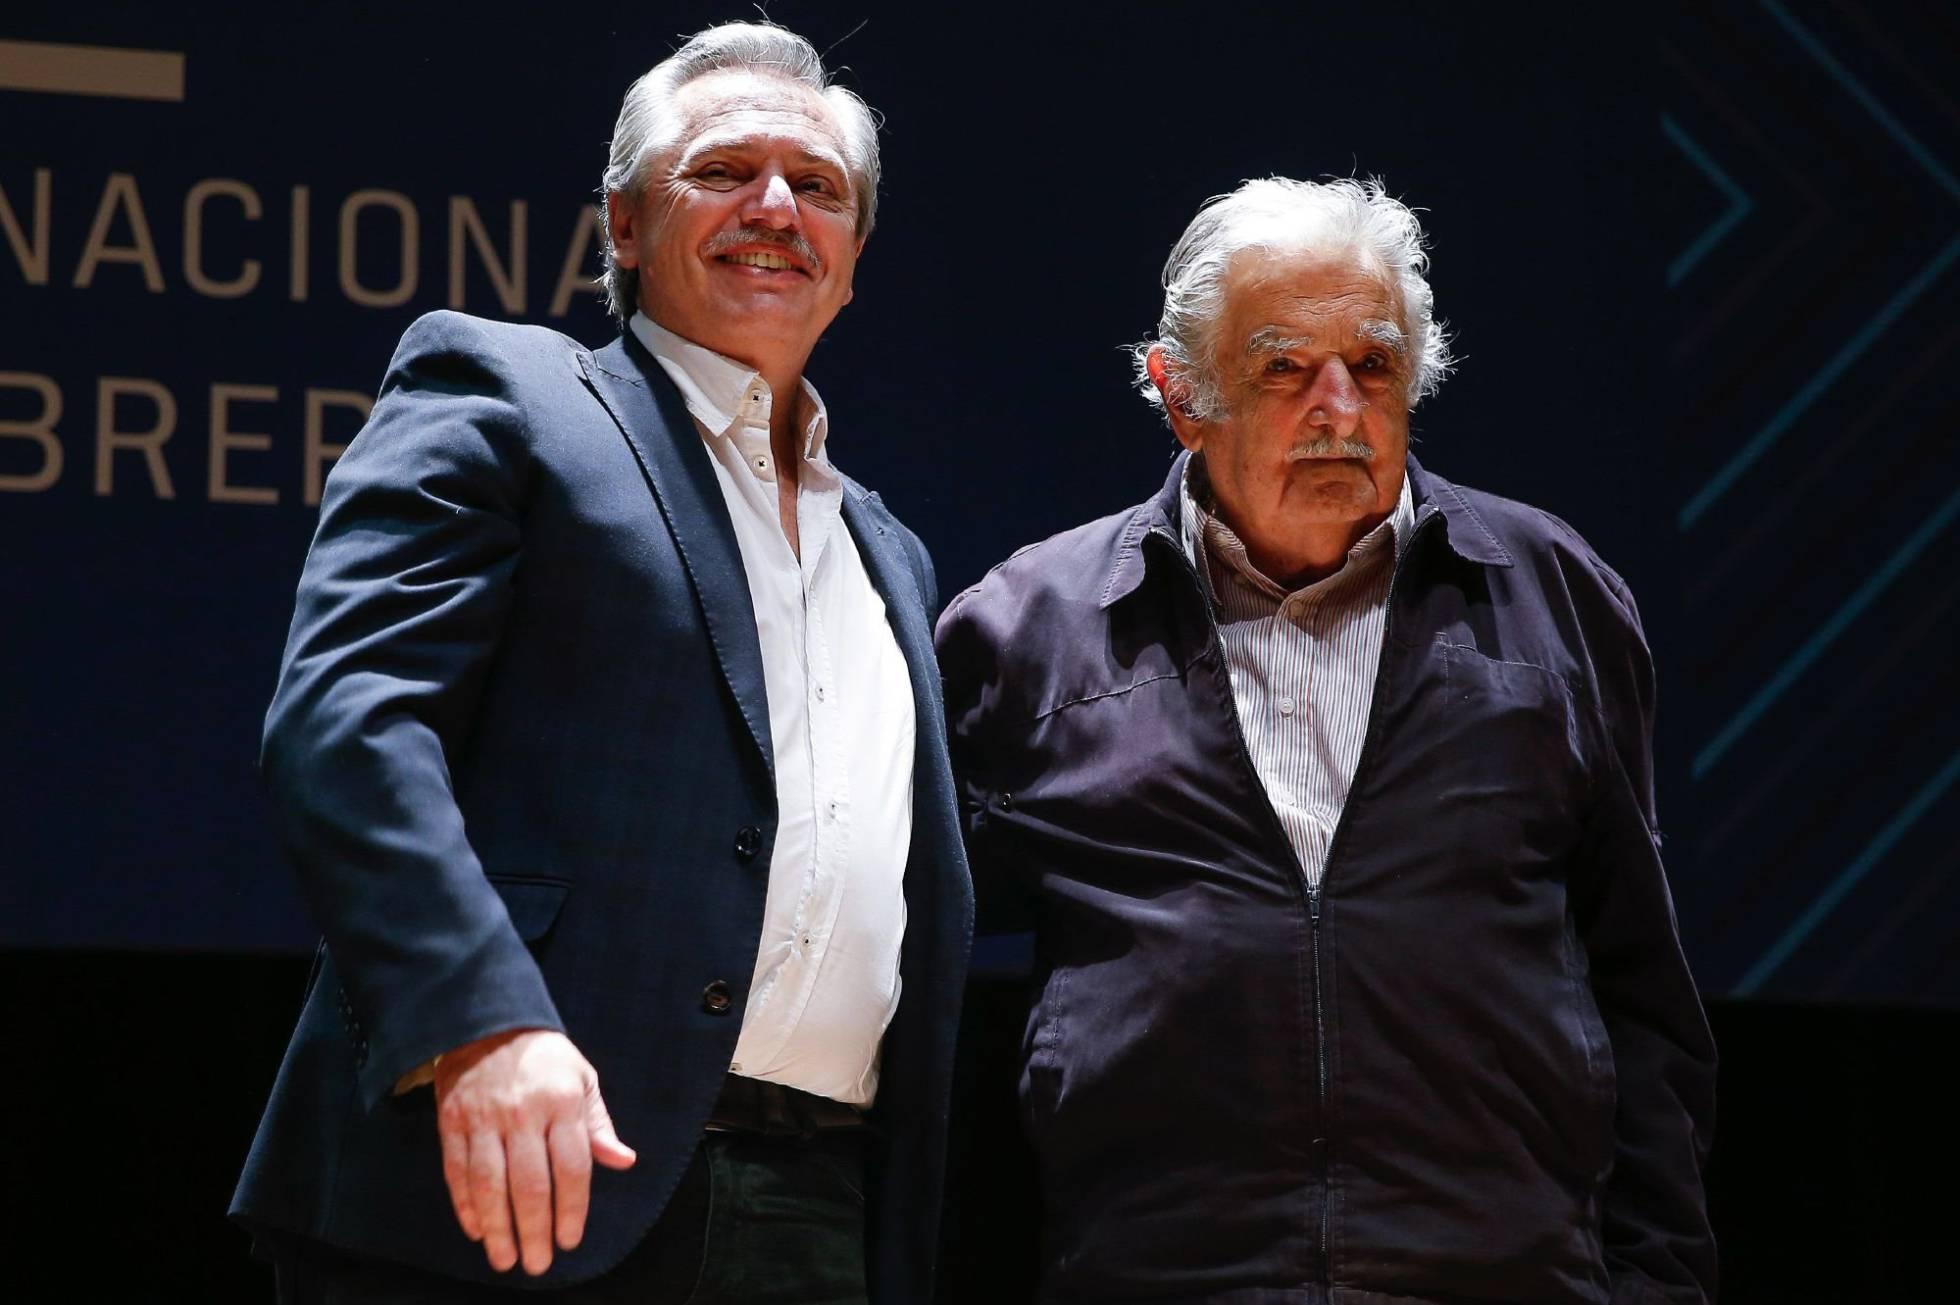 https://ep01.epimg.net/internacional/imagenes/2019/11/03/argentina/1572800666_317061_1572804397_noticia_normal_recorte1.jpg